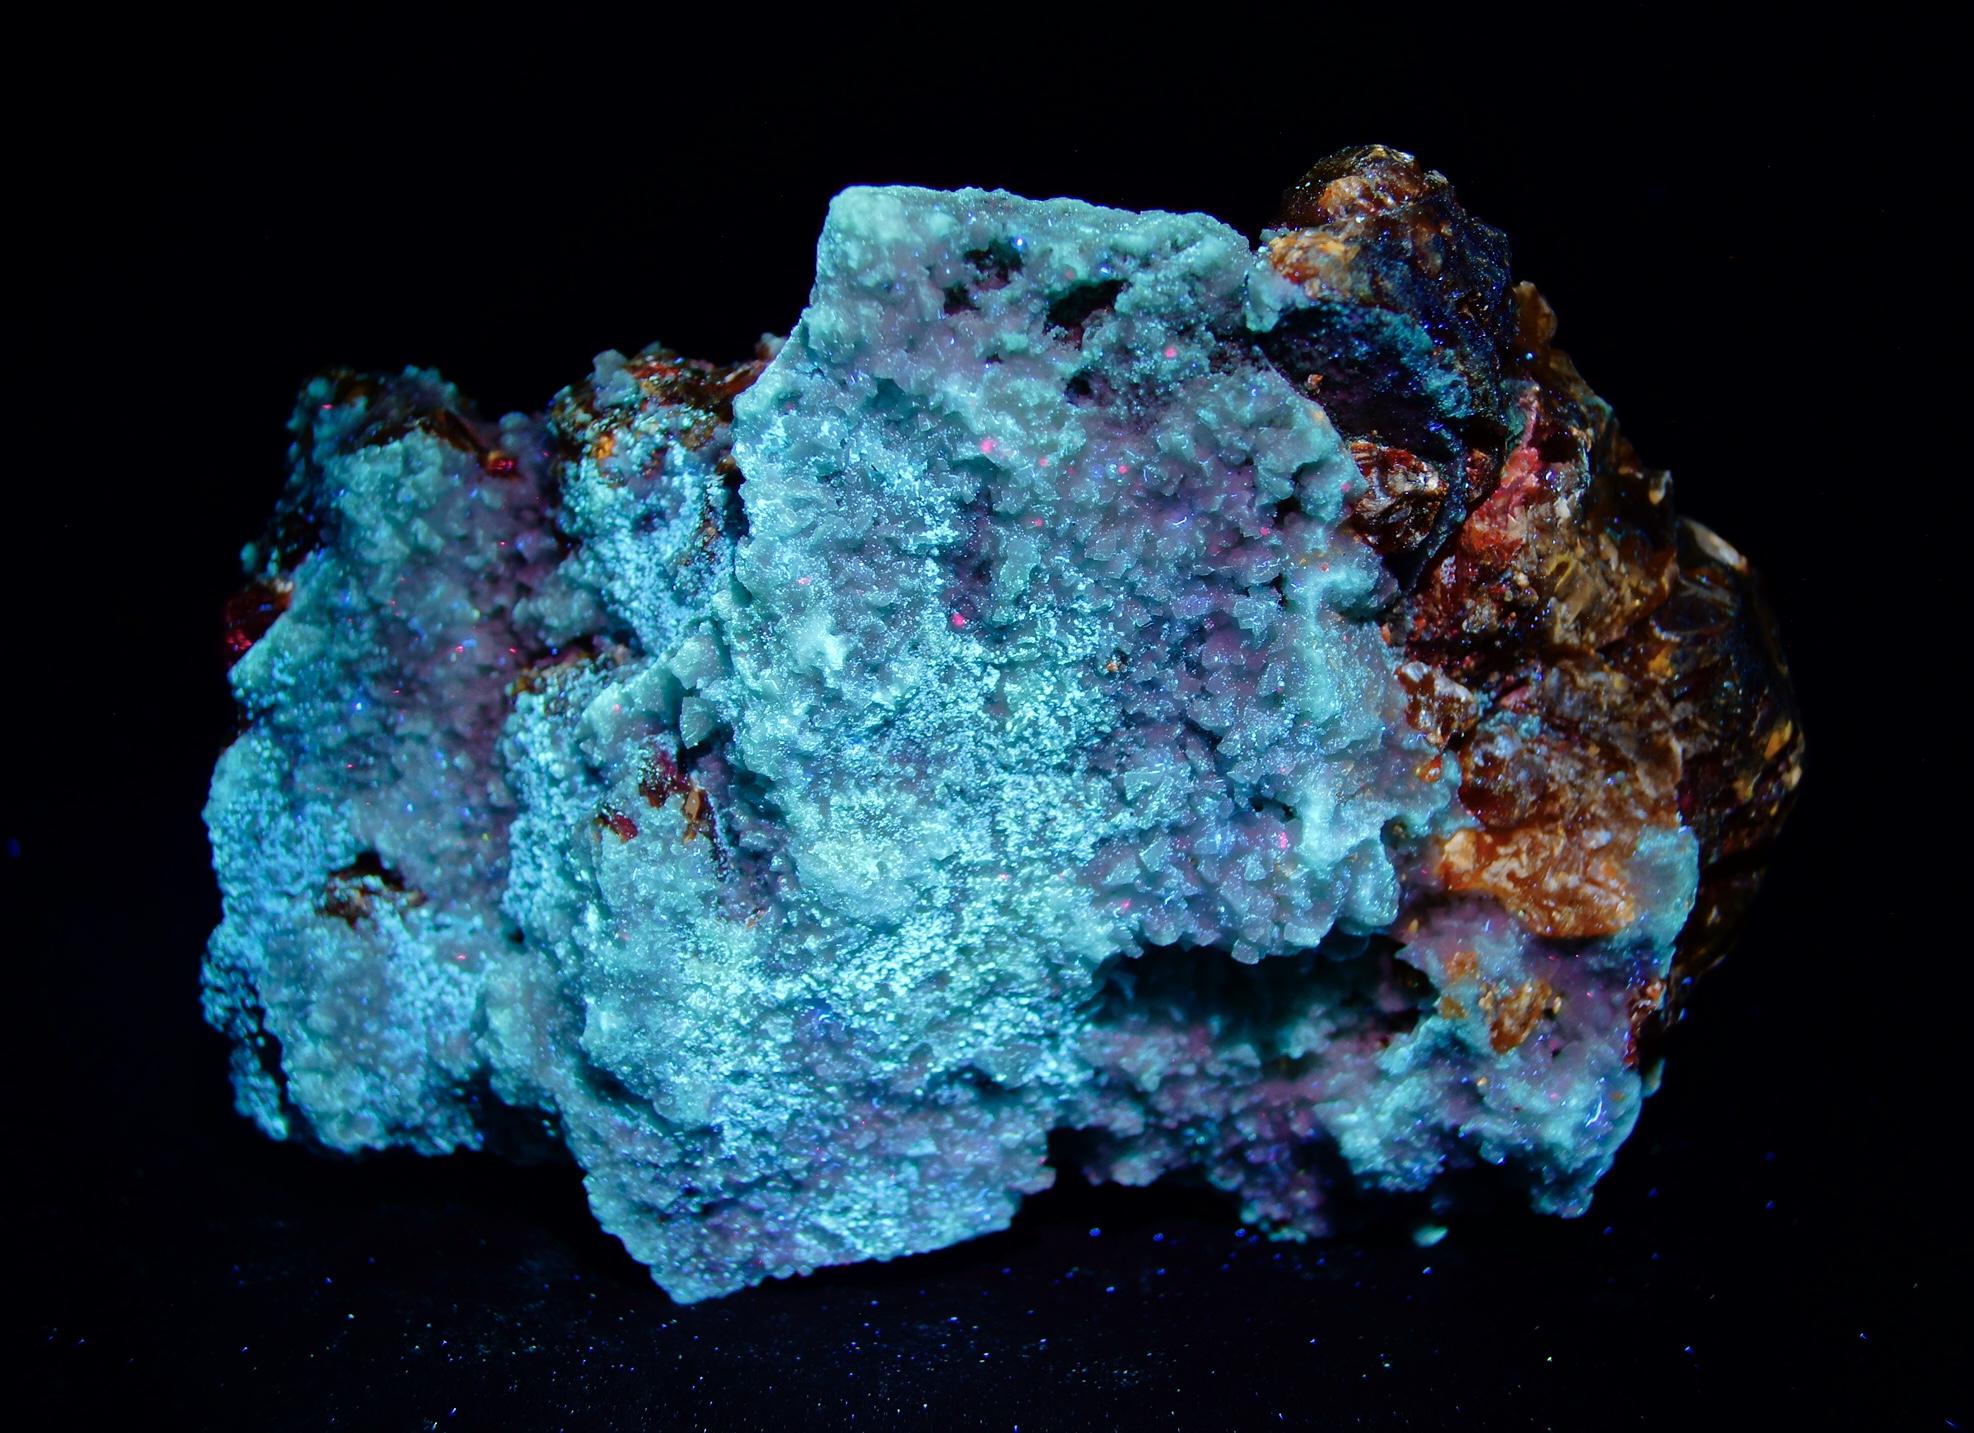 Colección de Minerales Fluorescentes - Página 5 Fullsi59